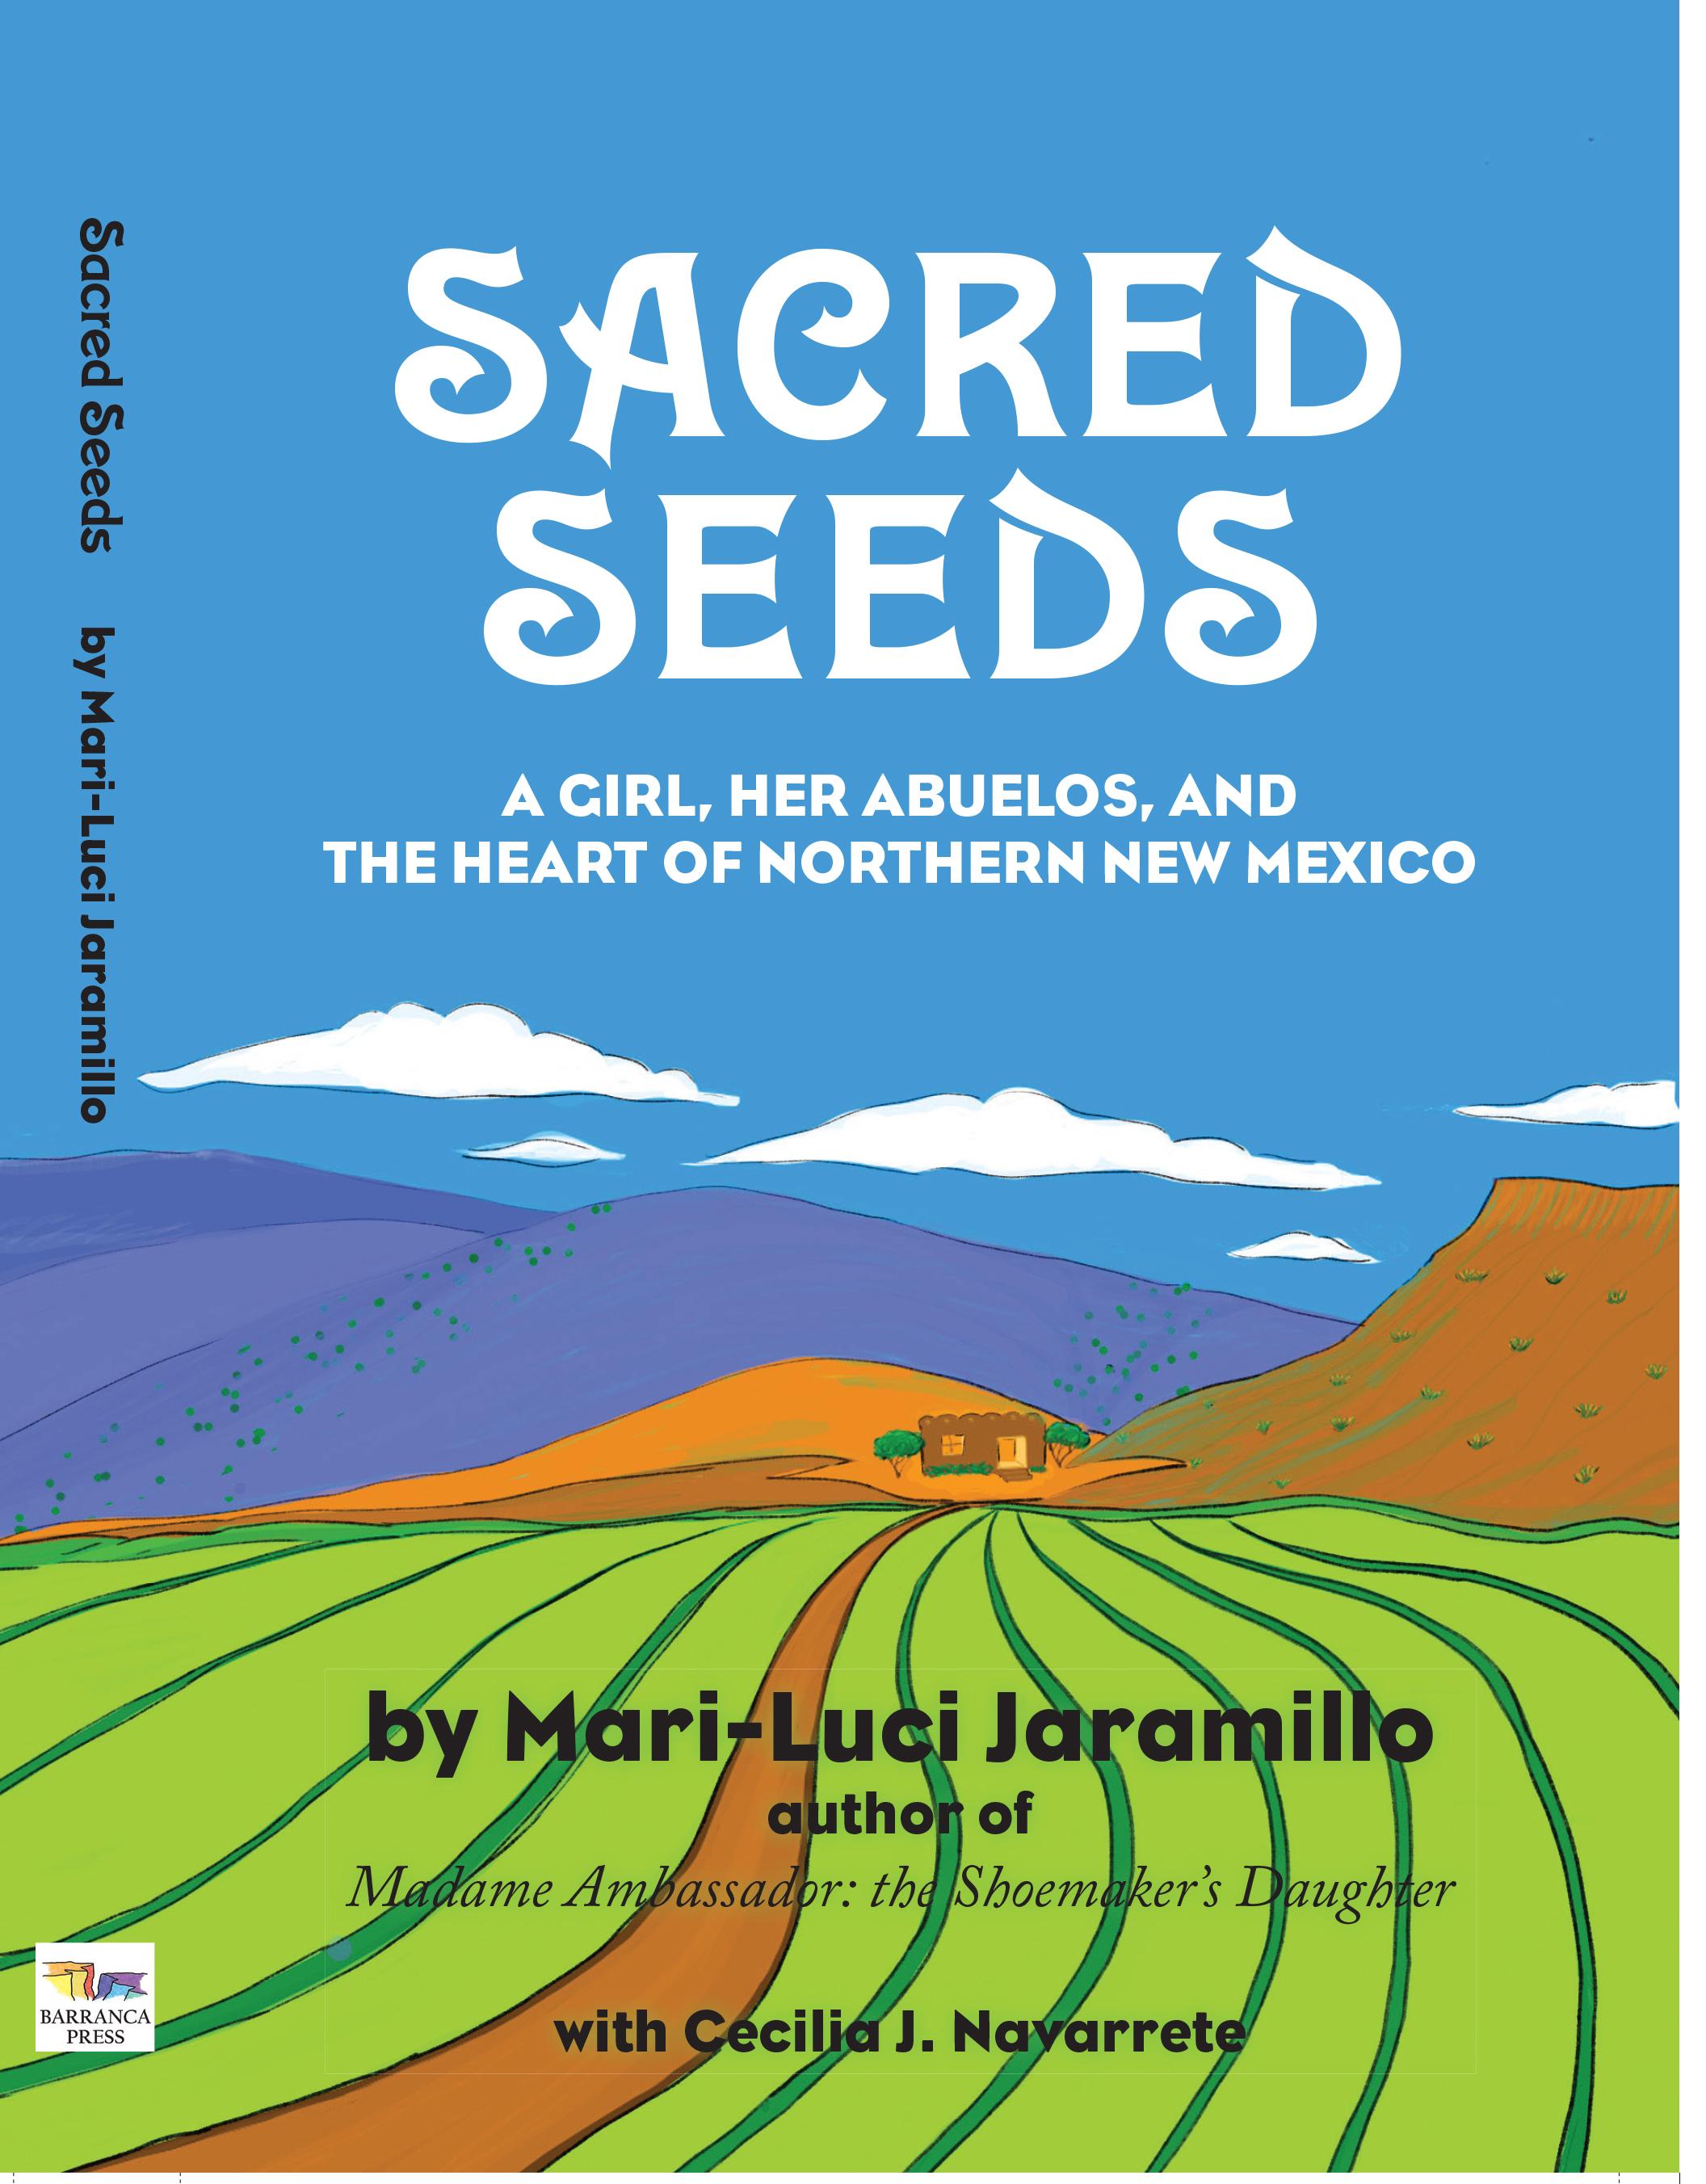 Cover Front n Spine_Sacred Seeds_Jaramillo.jpg